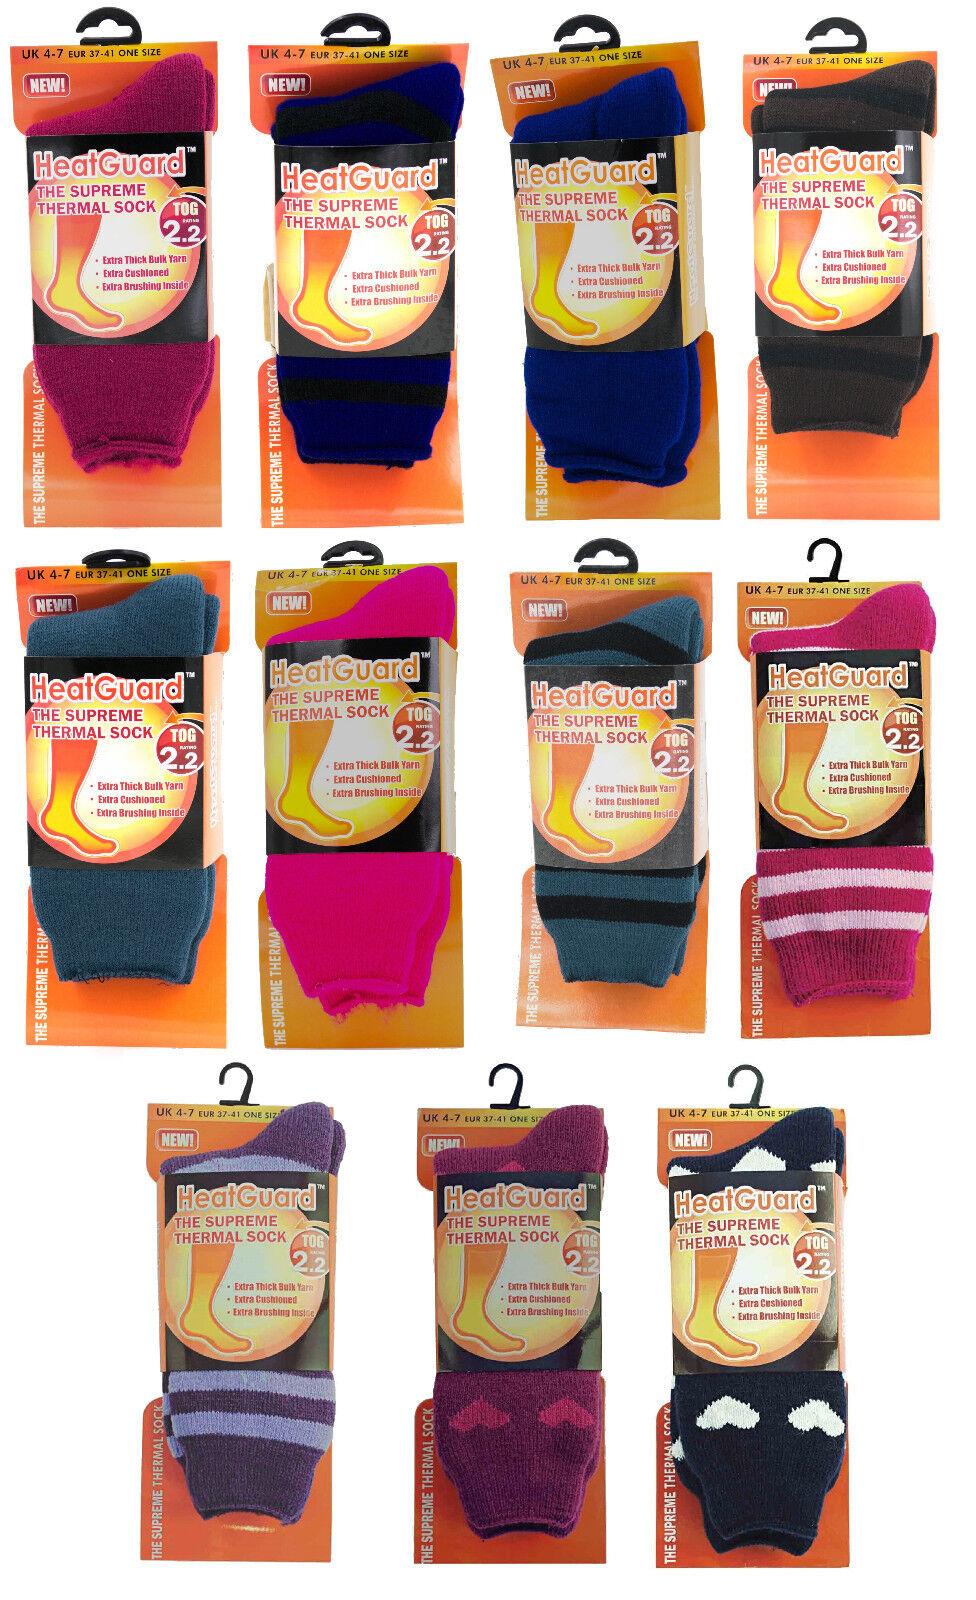 Ladies Heatguard Supreme Thermal Winter Socks ~ 2.2 Tog